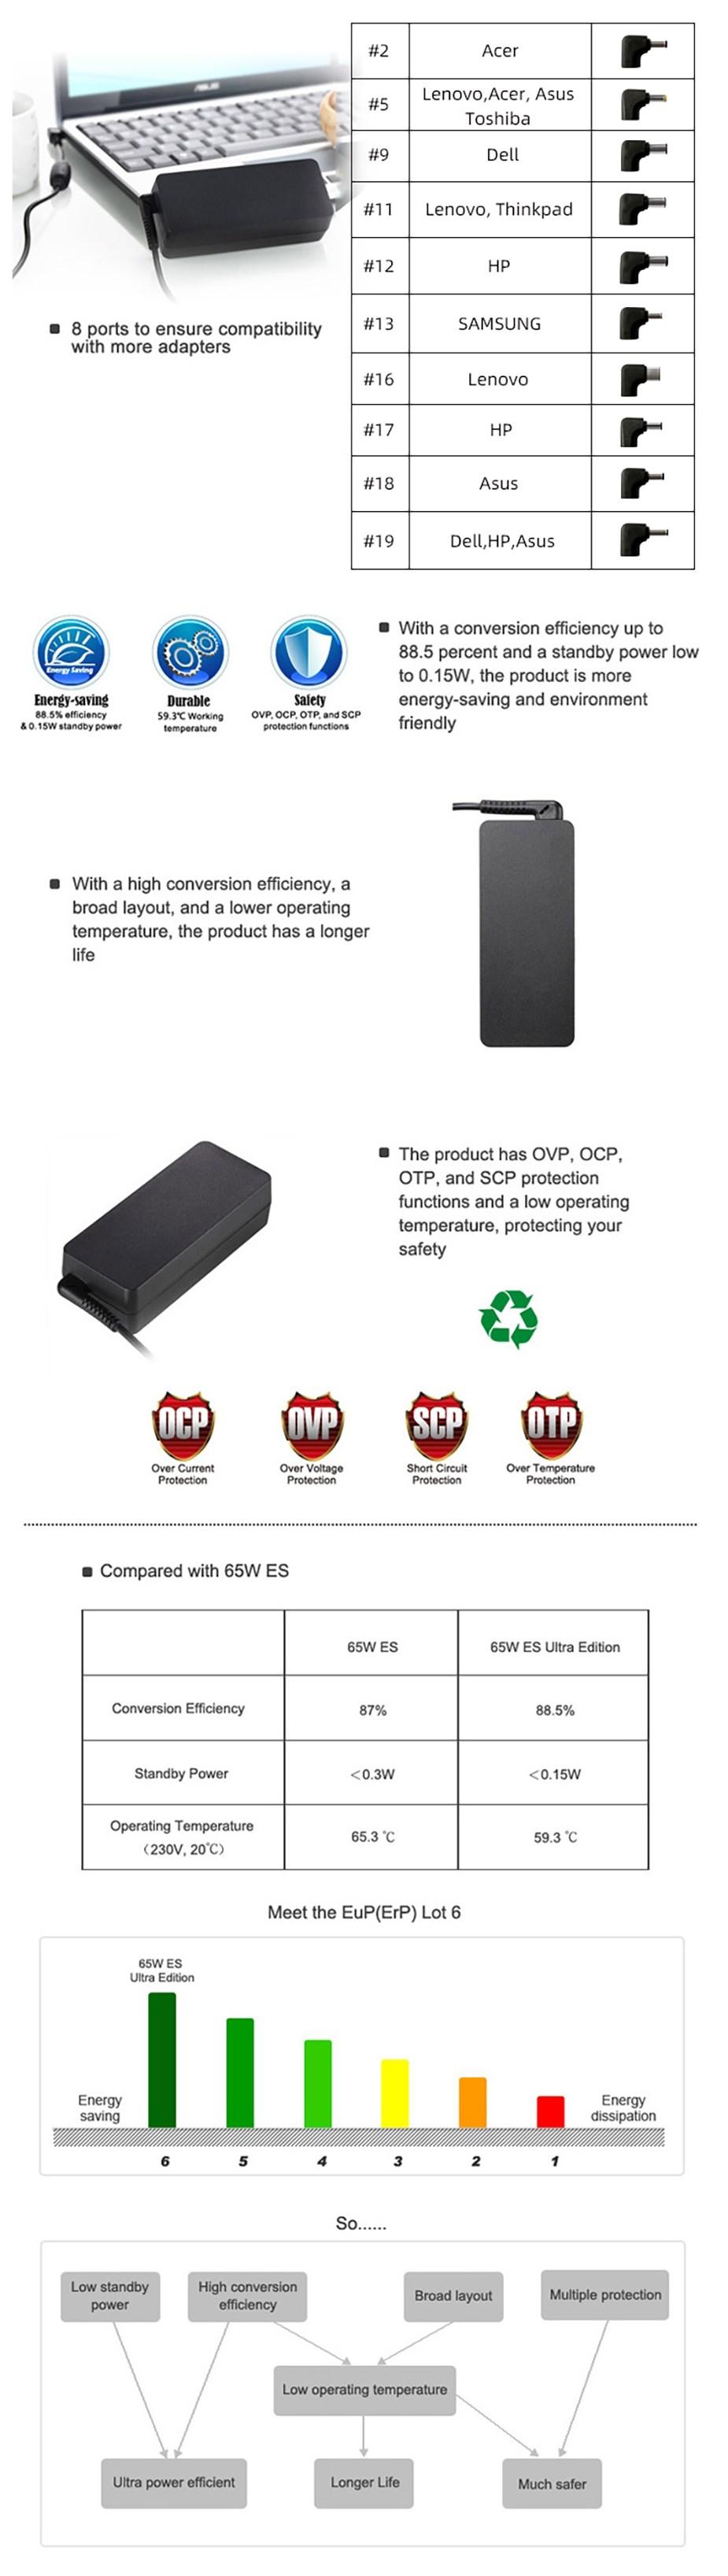 Huntkey HKA06519034-8K 65W ES III Edition Notebook Adapter - Overview 1